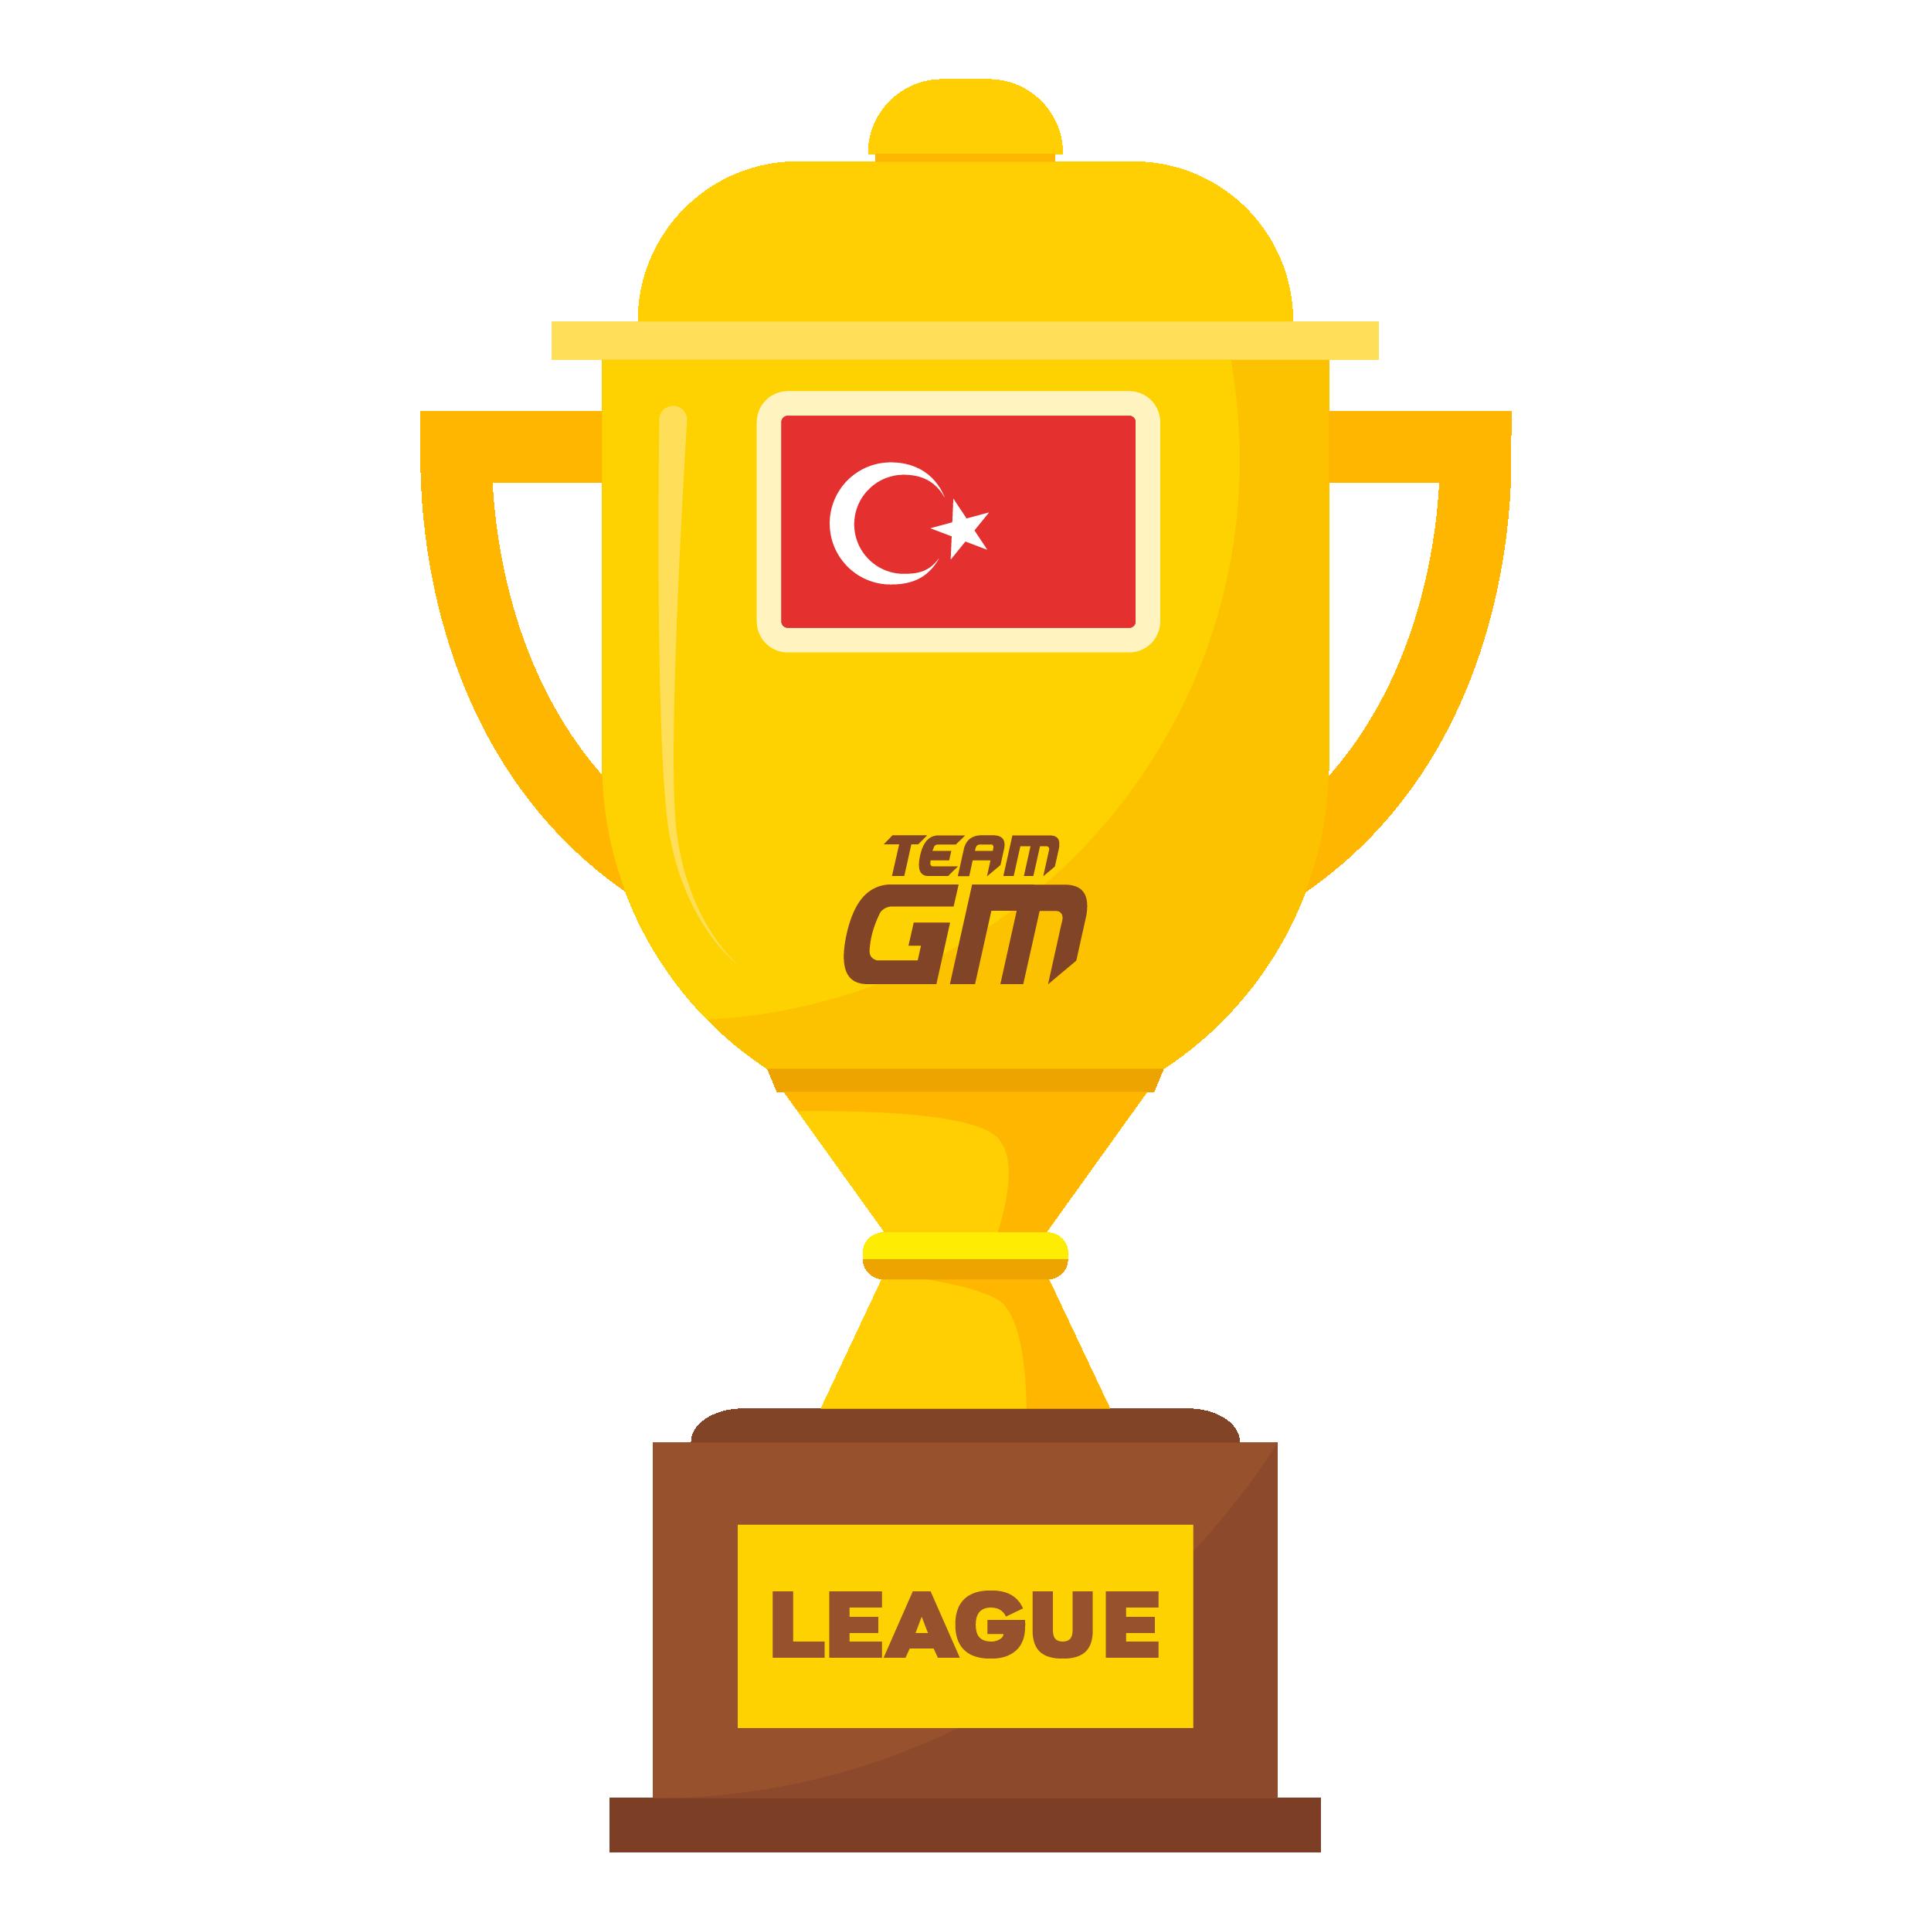 6TH - TURKISH LEAGUE